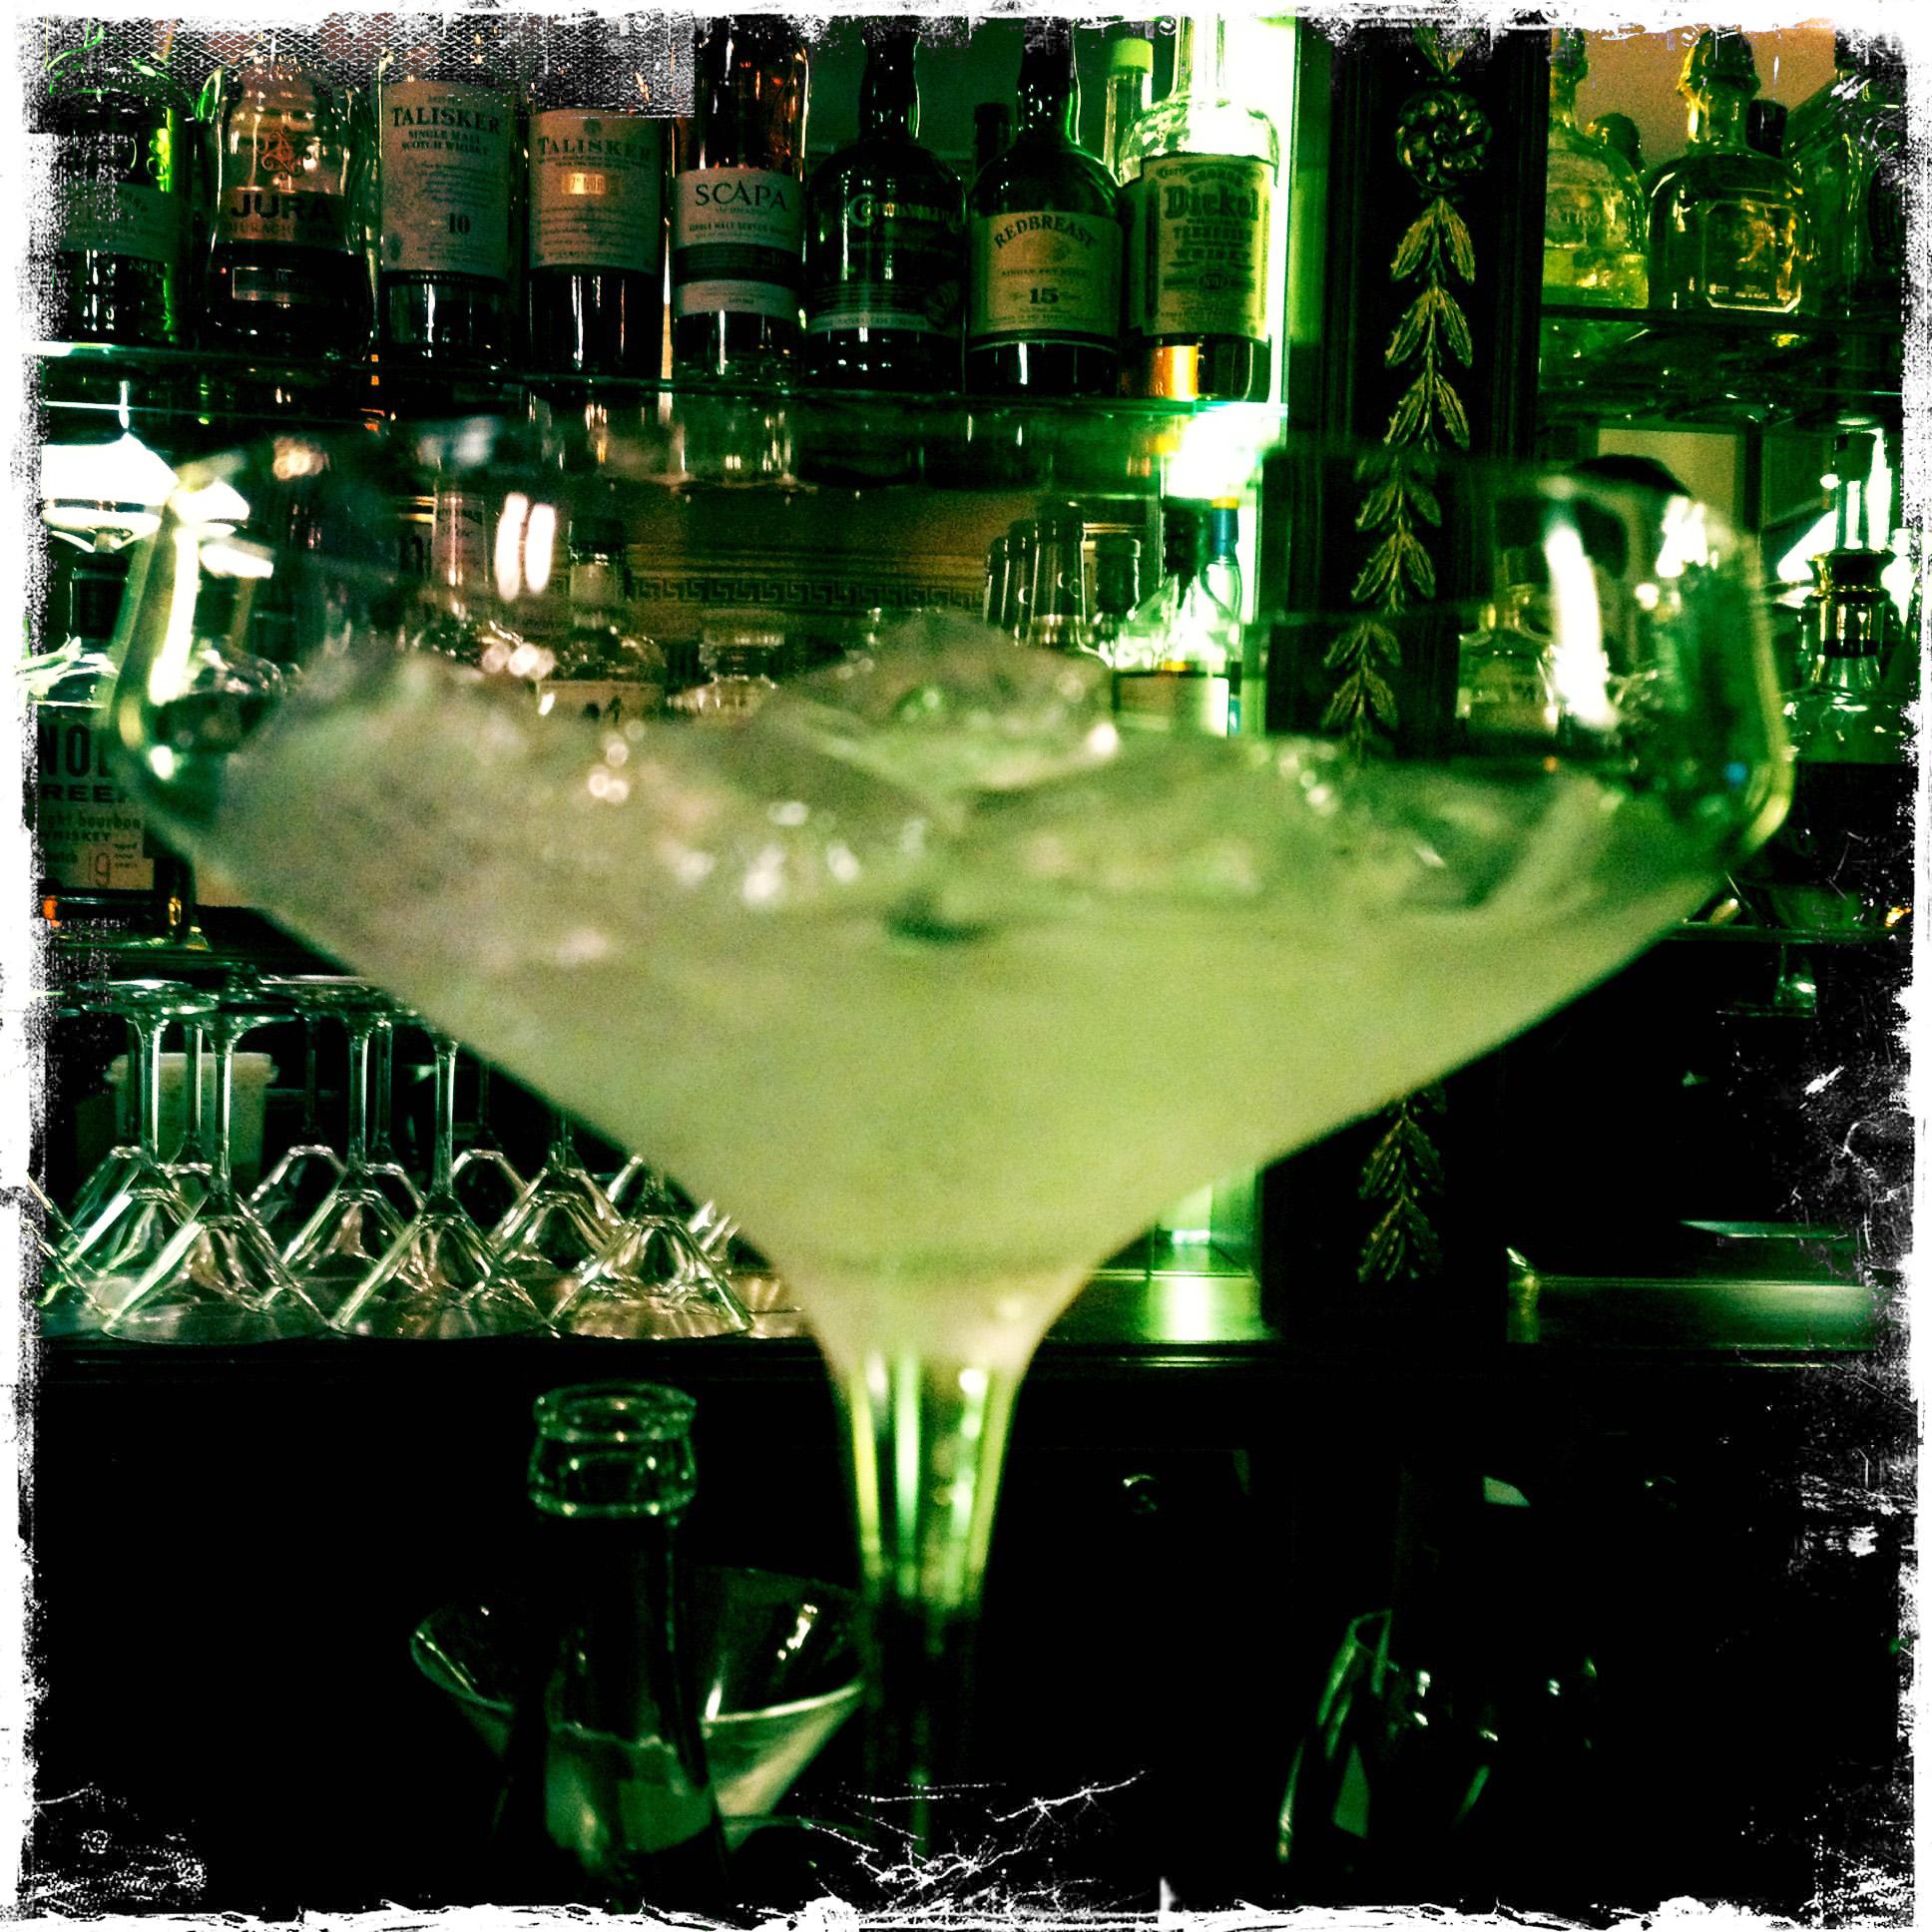 Cocktail - L'Hôtel - Laurent Beley 2